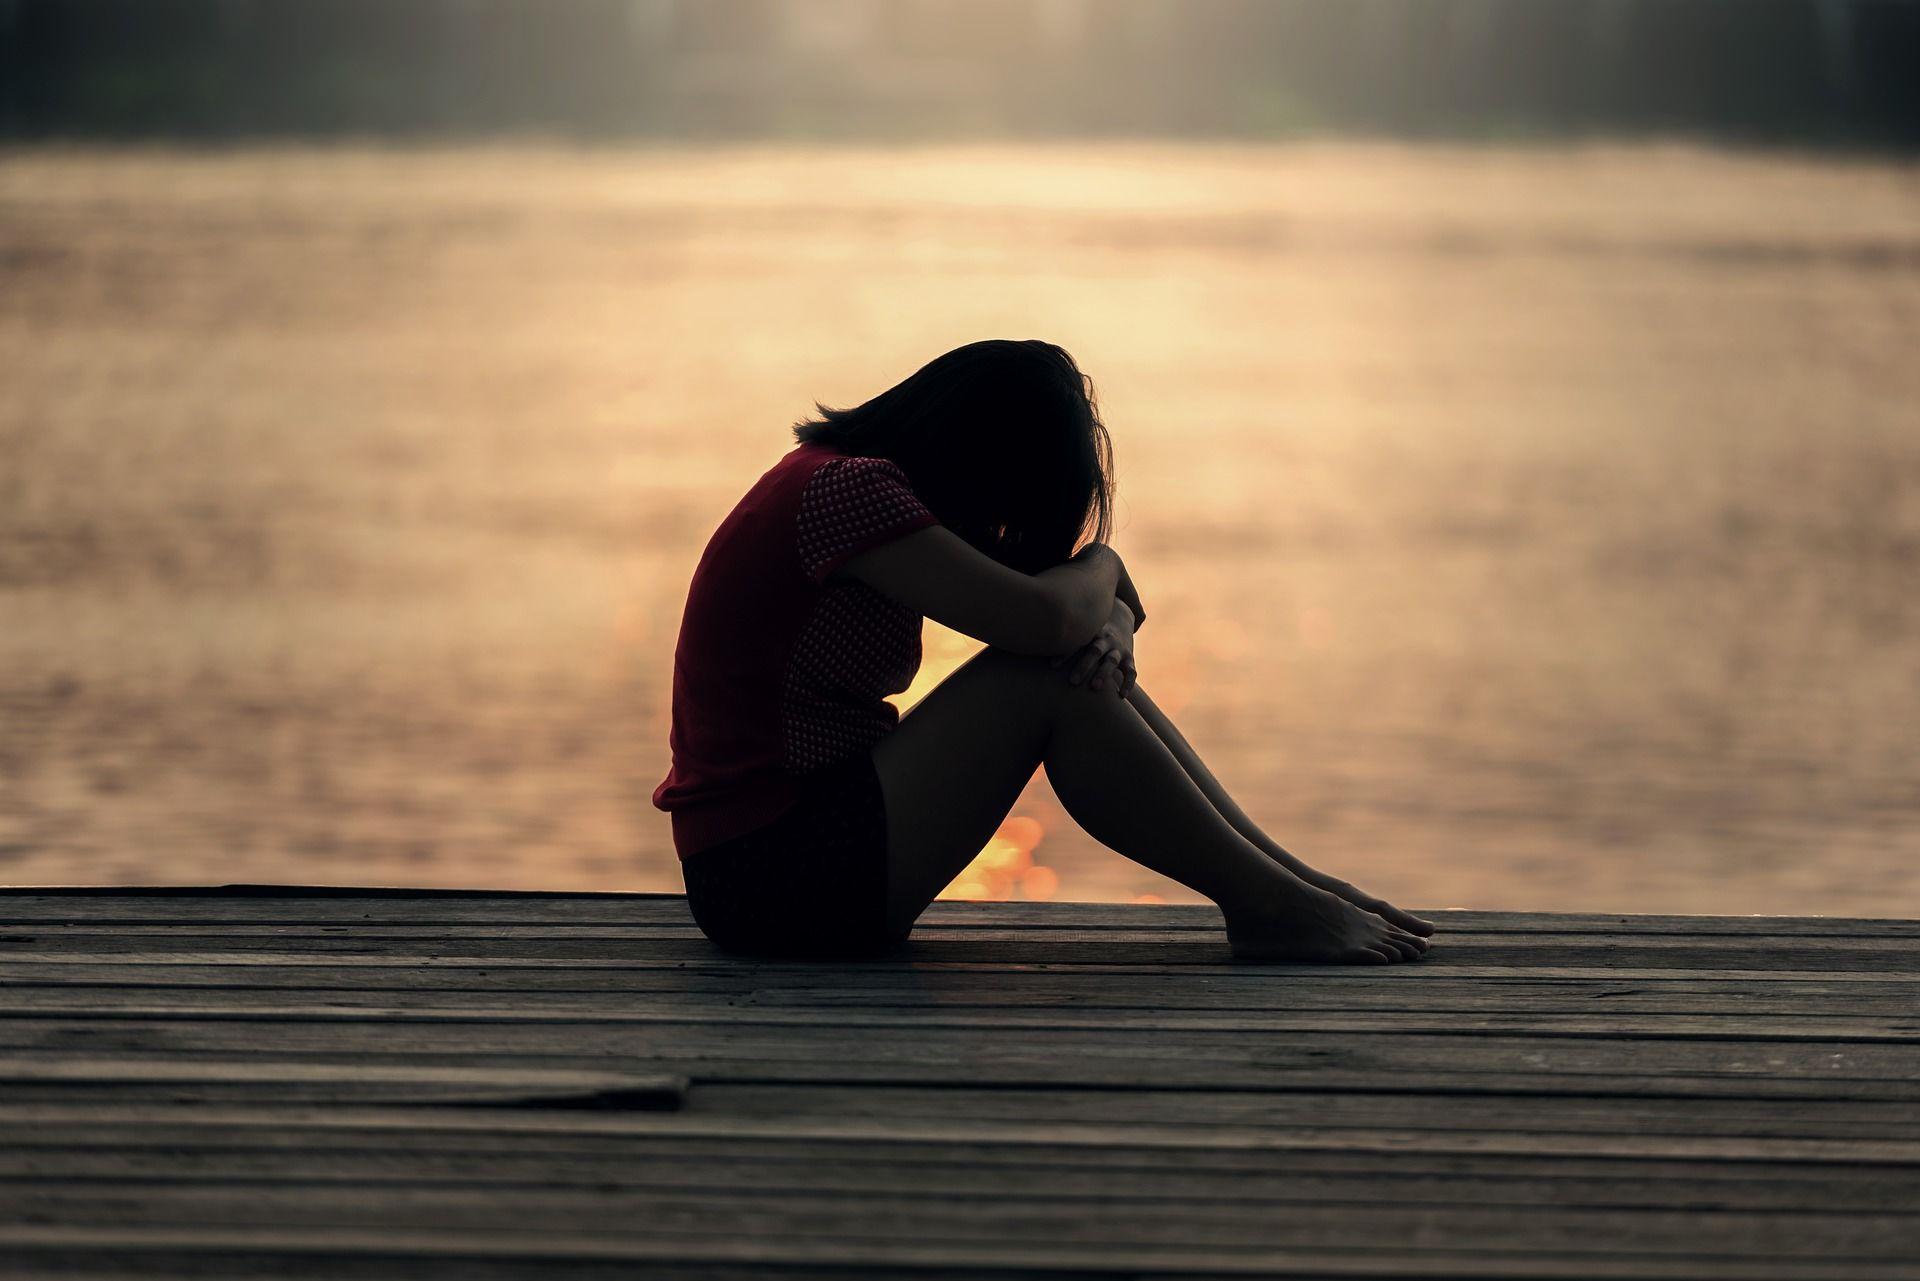 Sesakit Apapun Melepaskan, Percayalah Tuhan Pasti Akan Ganti Dengan Yang Lebih Baik